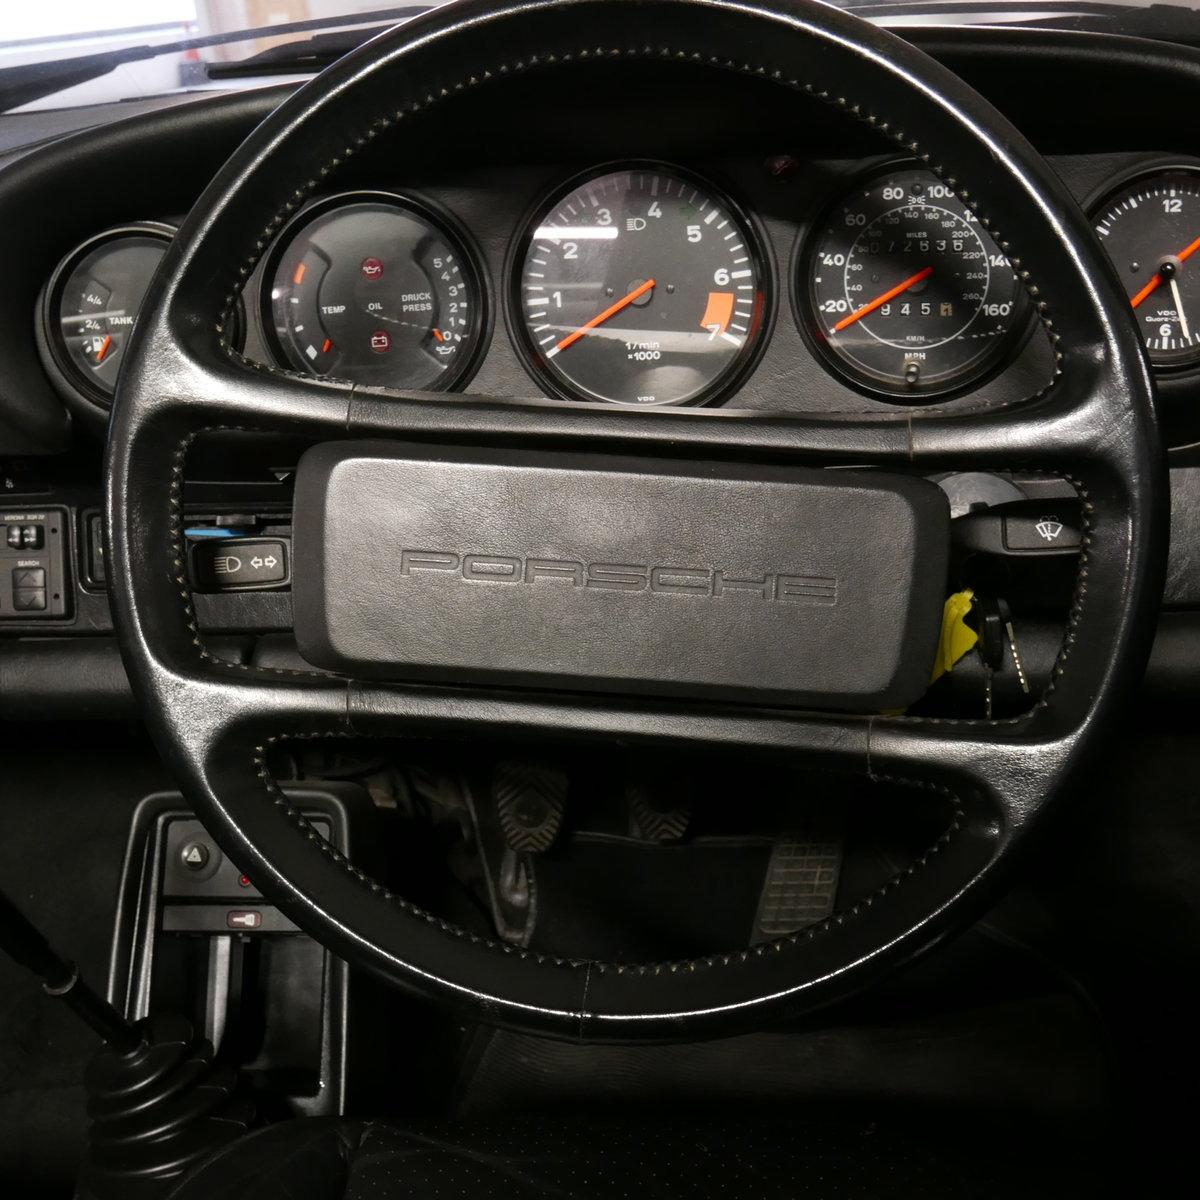 1986 Porsche 911 Carrera Cabriolet RHD  SOLD (picture 6 of 19)